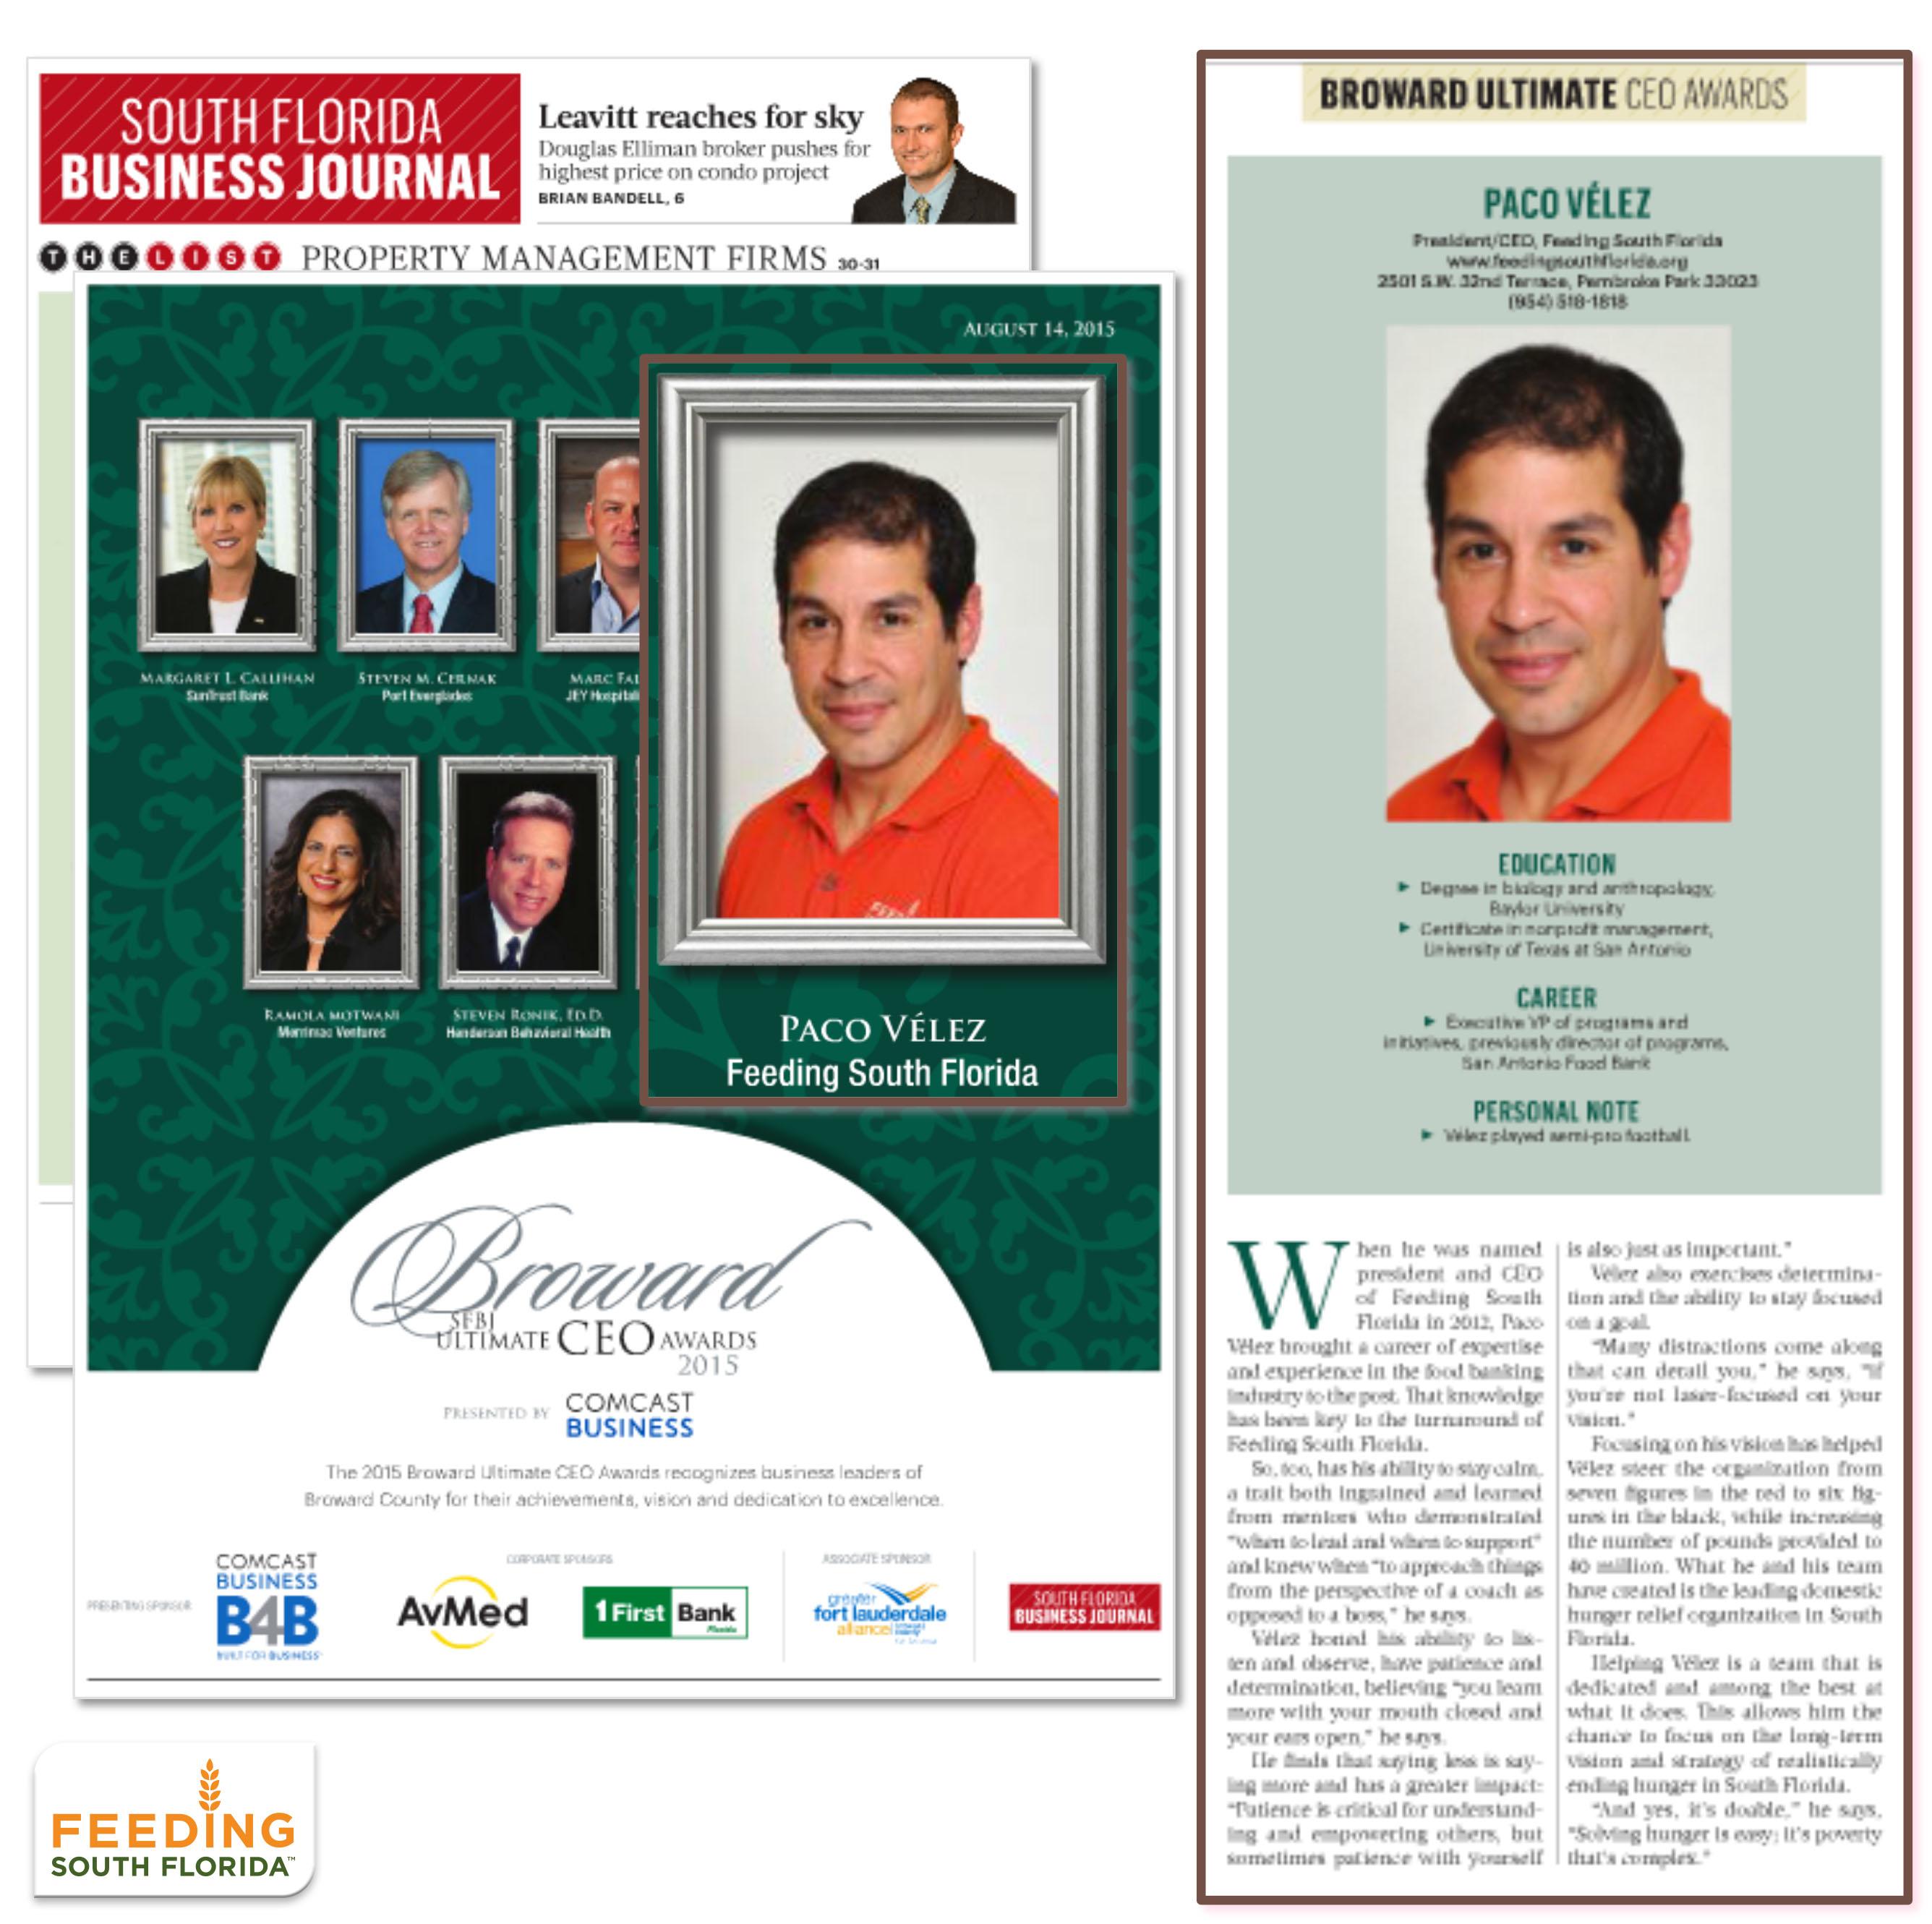 Microsoft Word - South Florida Business Journal - Feeding South